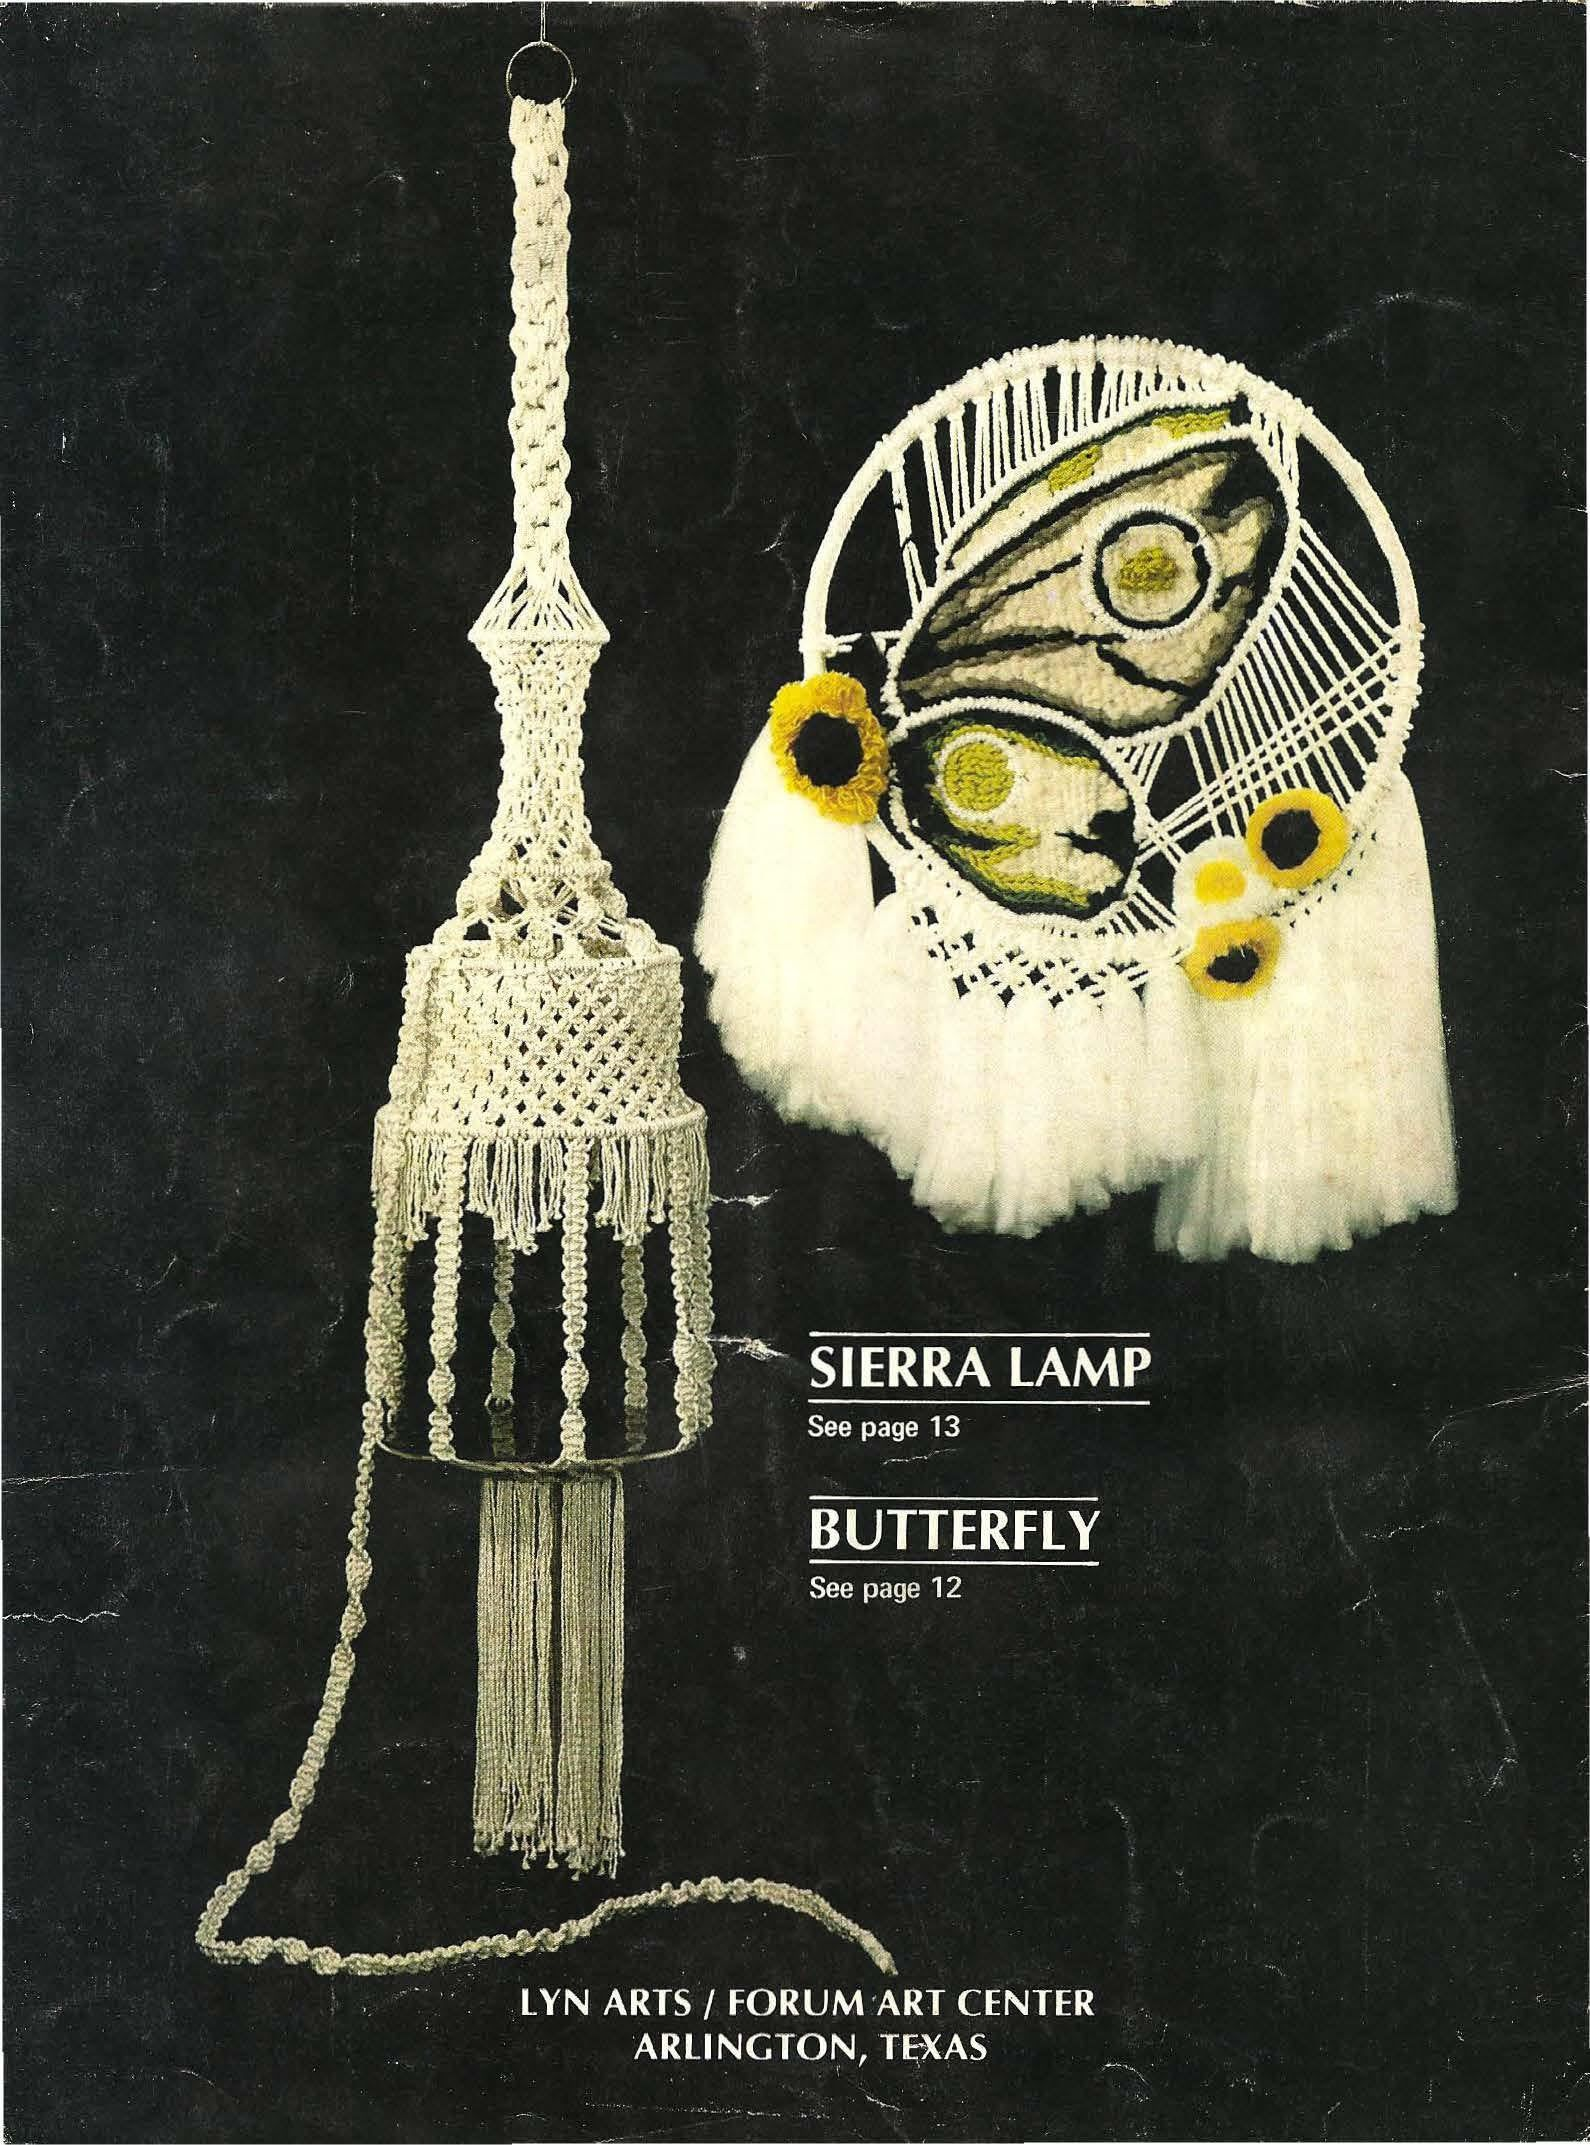 Vintage Macrame Wall Hanging Pattern, Macrame Pattern Sierra Lamp and Butterfly, Decorative Macrame, Old Pattern Macrame